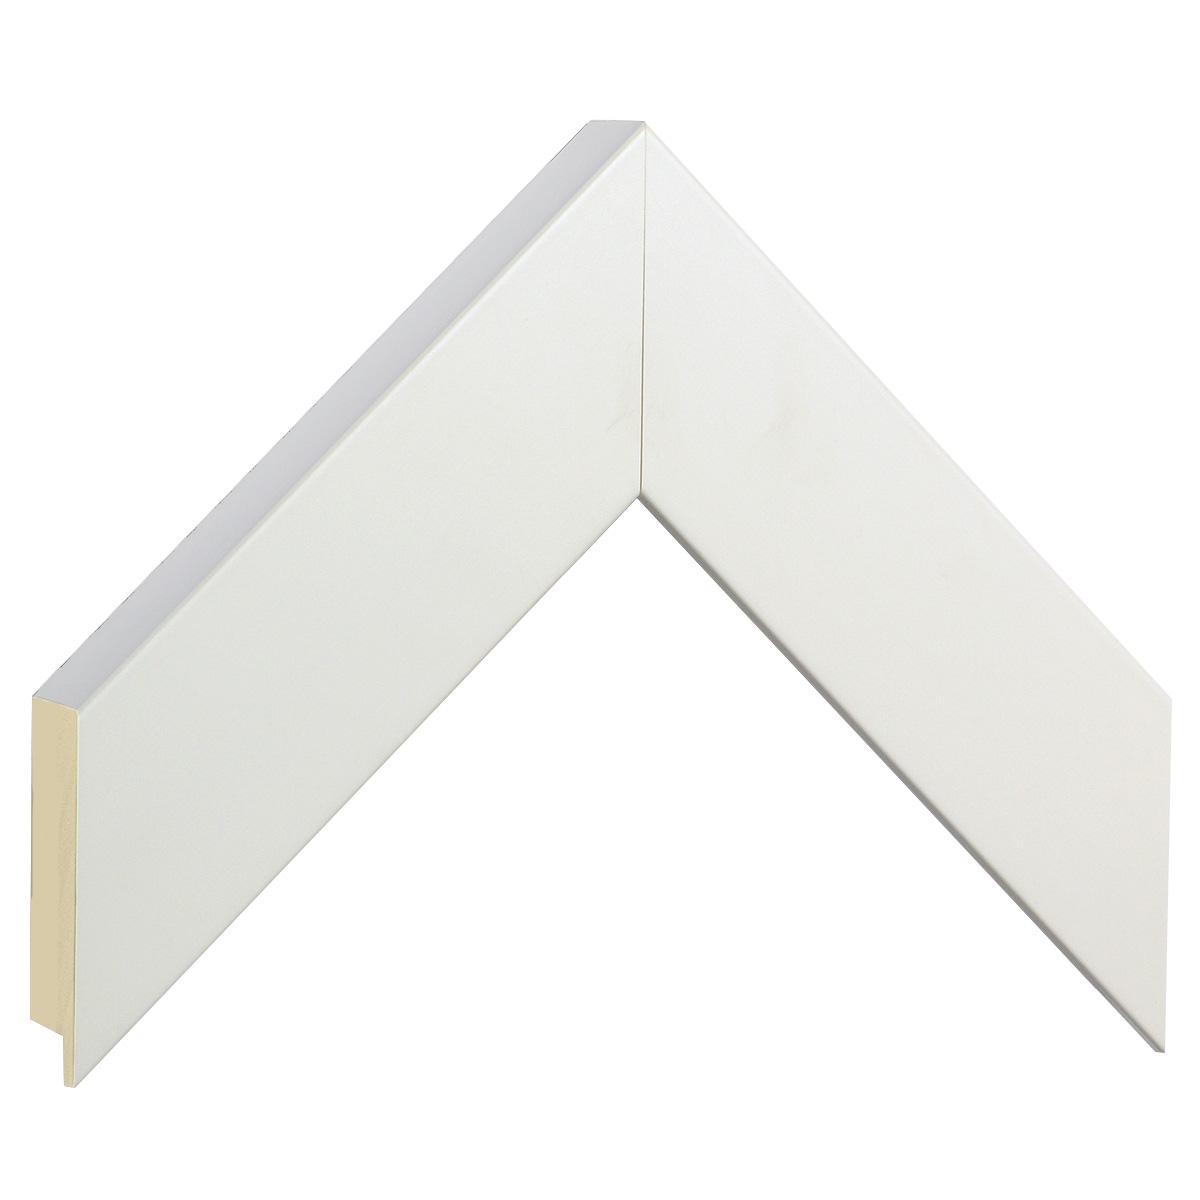 Moulding ayous, width 50mm height 32 -  matt white